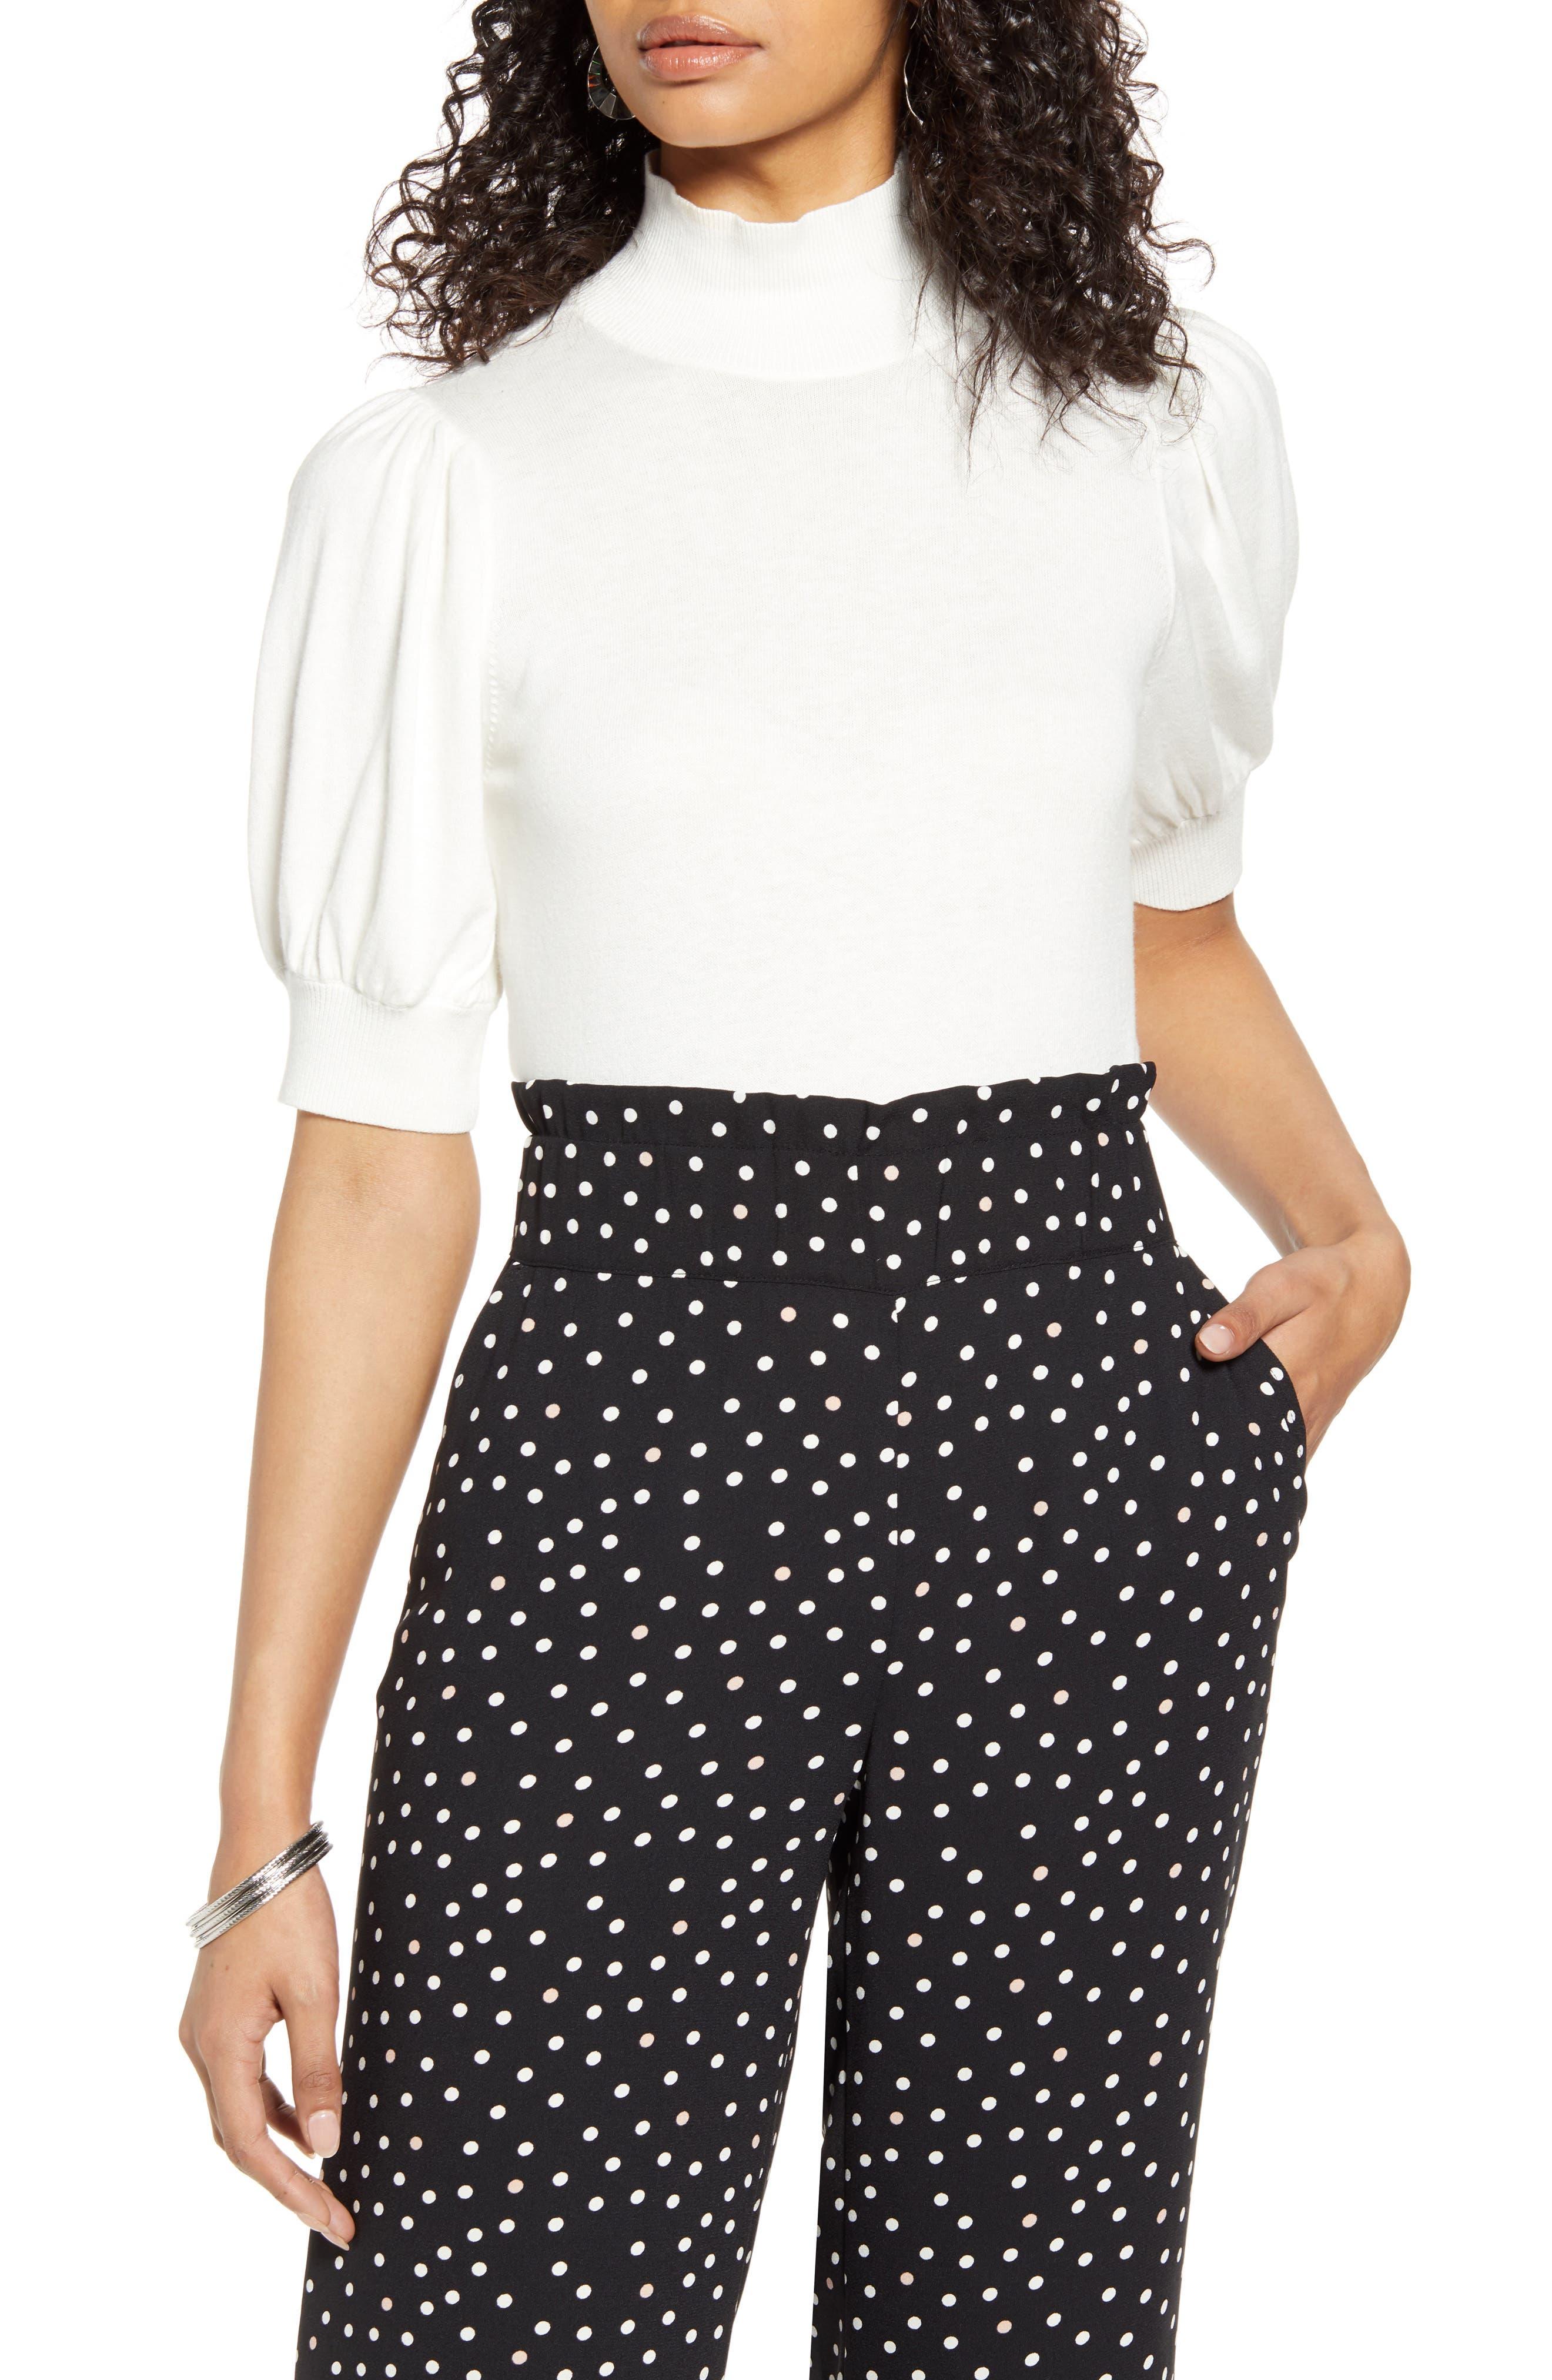 Vintage Tops & Retro Shirts, Halter Tops, Blouses Womens Halogen Mock Neck Puff Shoulder Sweater Size X-Small - Ivory $41.40 AT vintagedancer.com